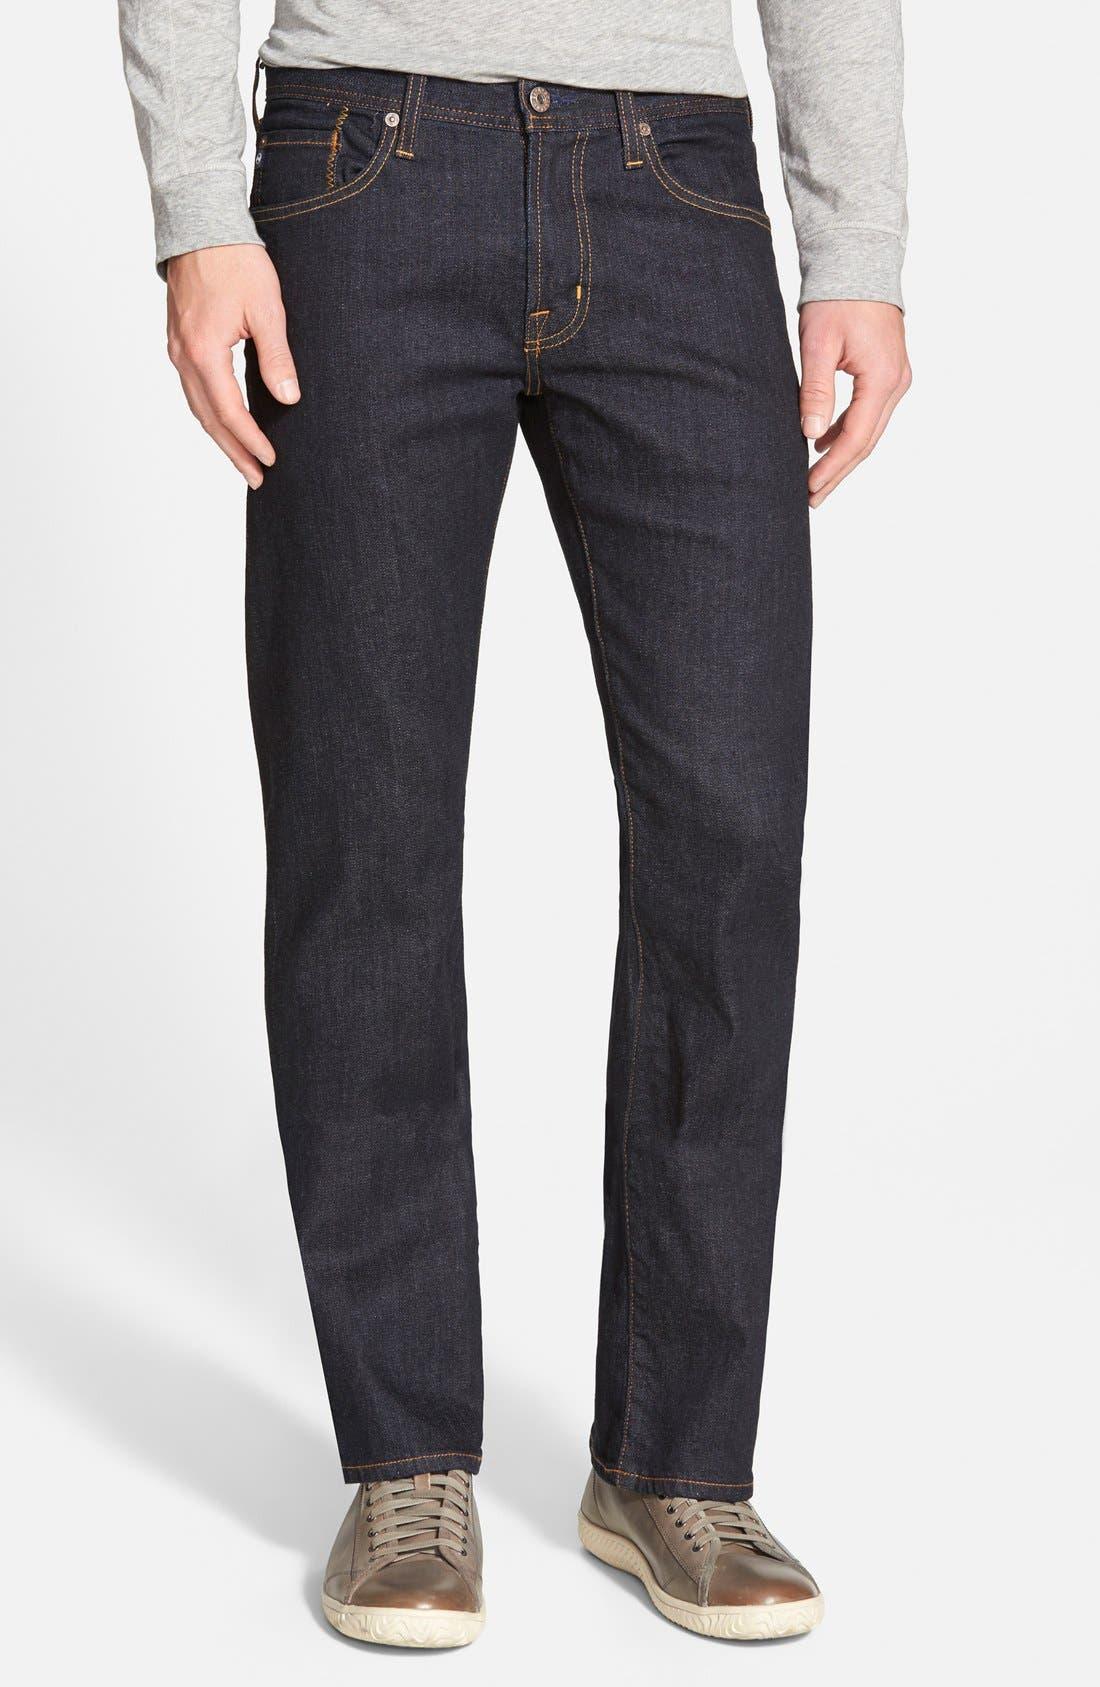 Protégé Straight Leg Jeans,                             Main thumbnail 1, color,                             461